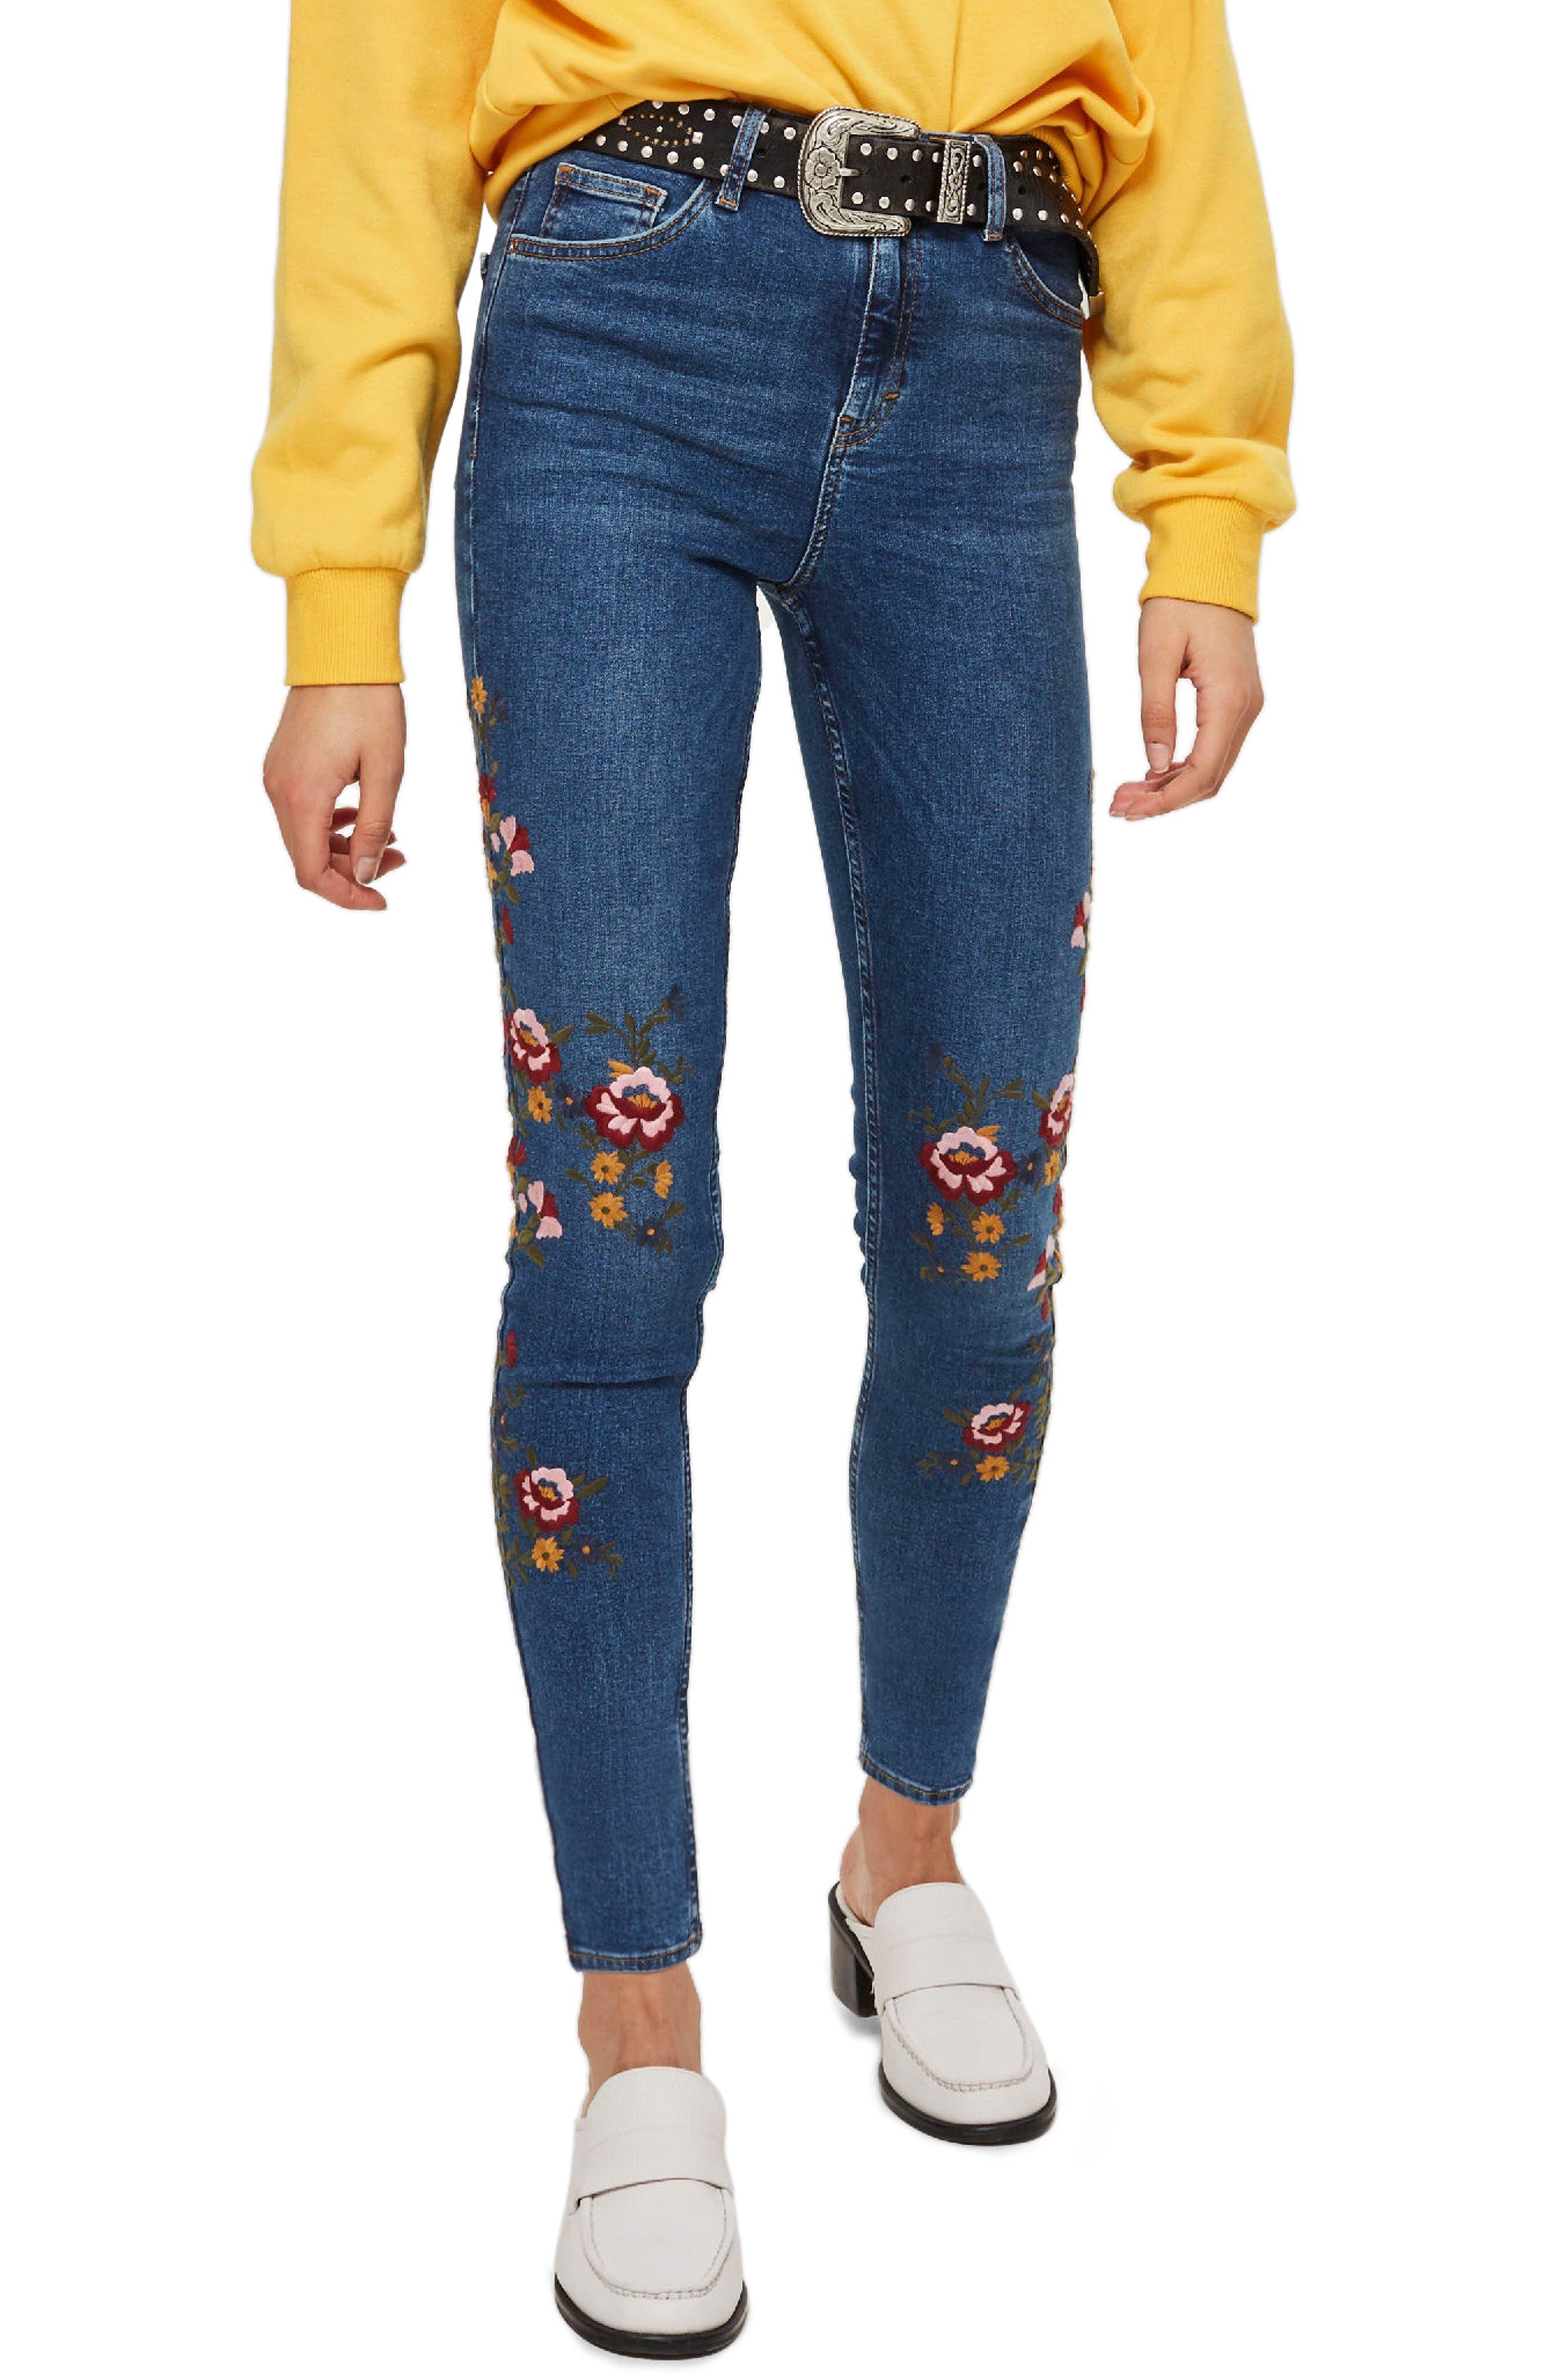 Jamie Ditsy Floral Jeans,                             Main thumbnail 1, color,                             Mid Denim Multi